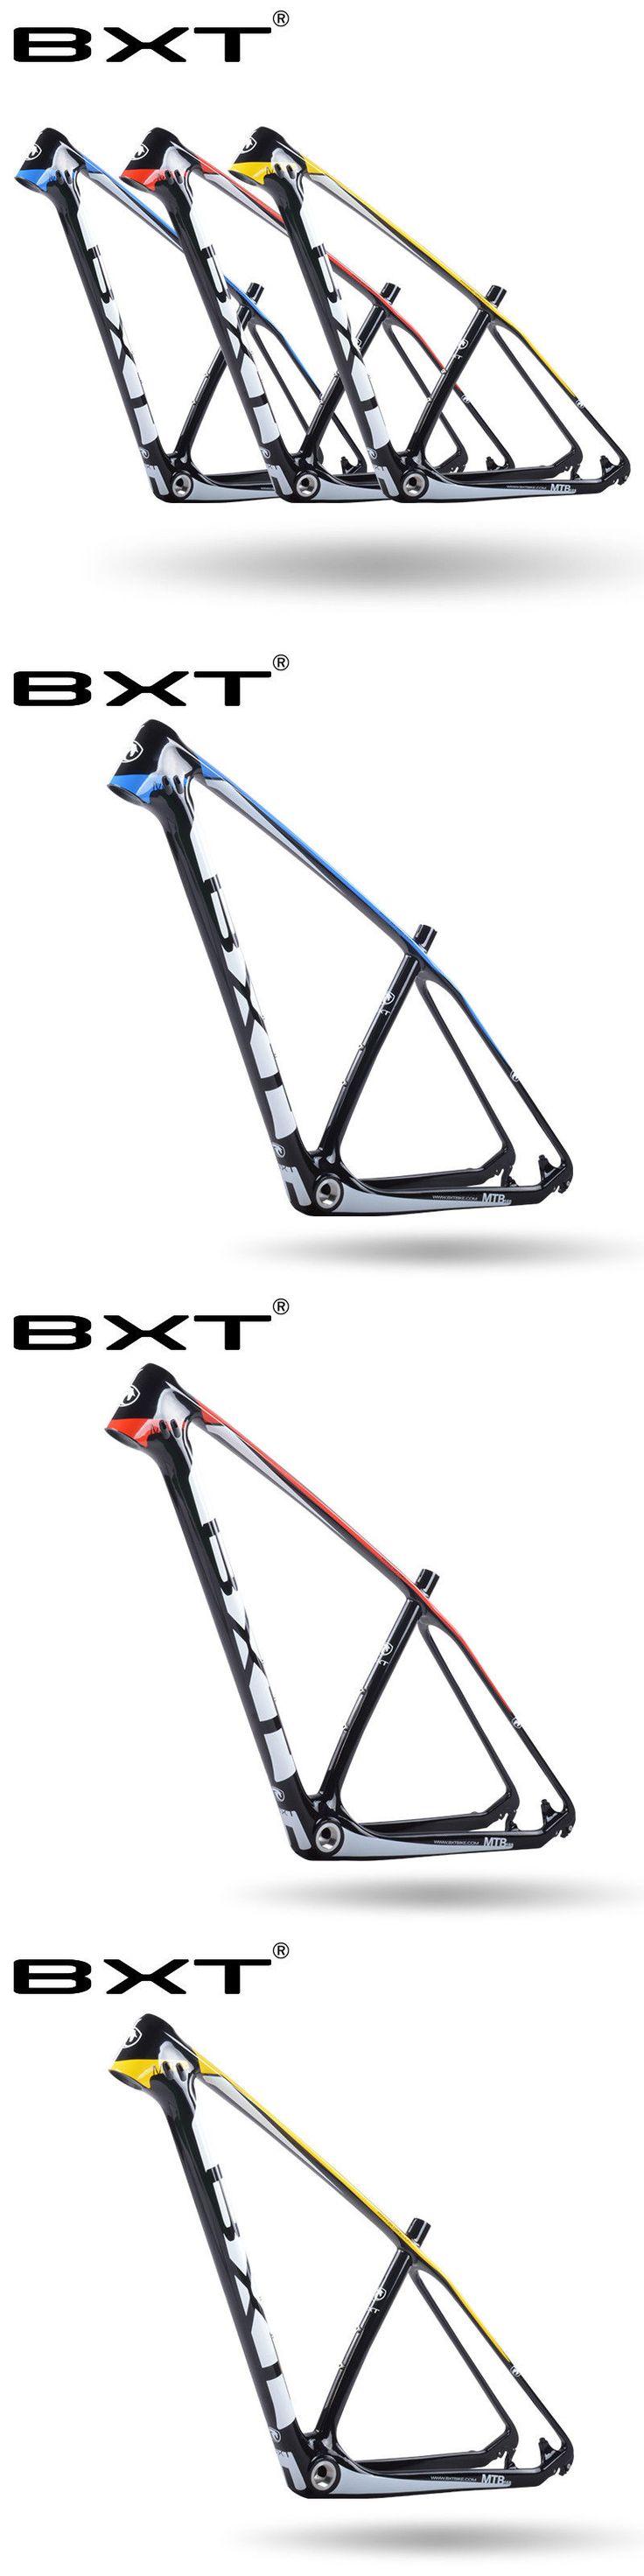 Bicycle Frames 22679: Mtb Frame T800 Full Carbon Fiber Mountain Bicycle 29Er Frames Mtb Bike Frameset -> BUY IT NOW ONLY: $299 on eBay!